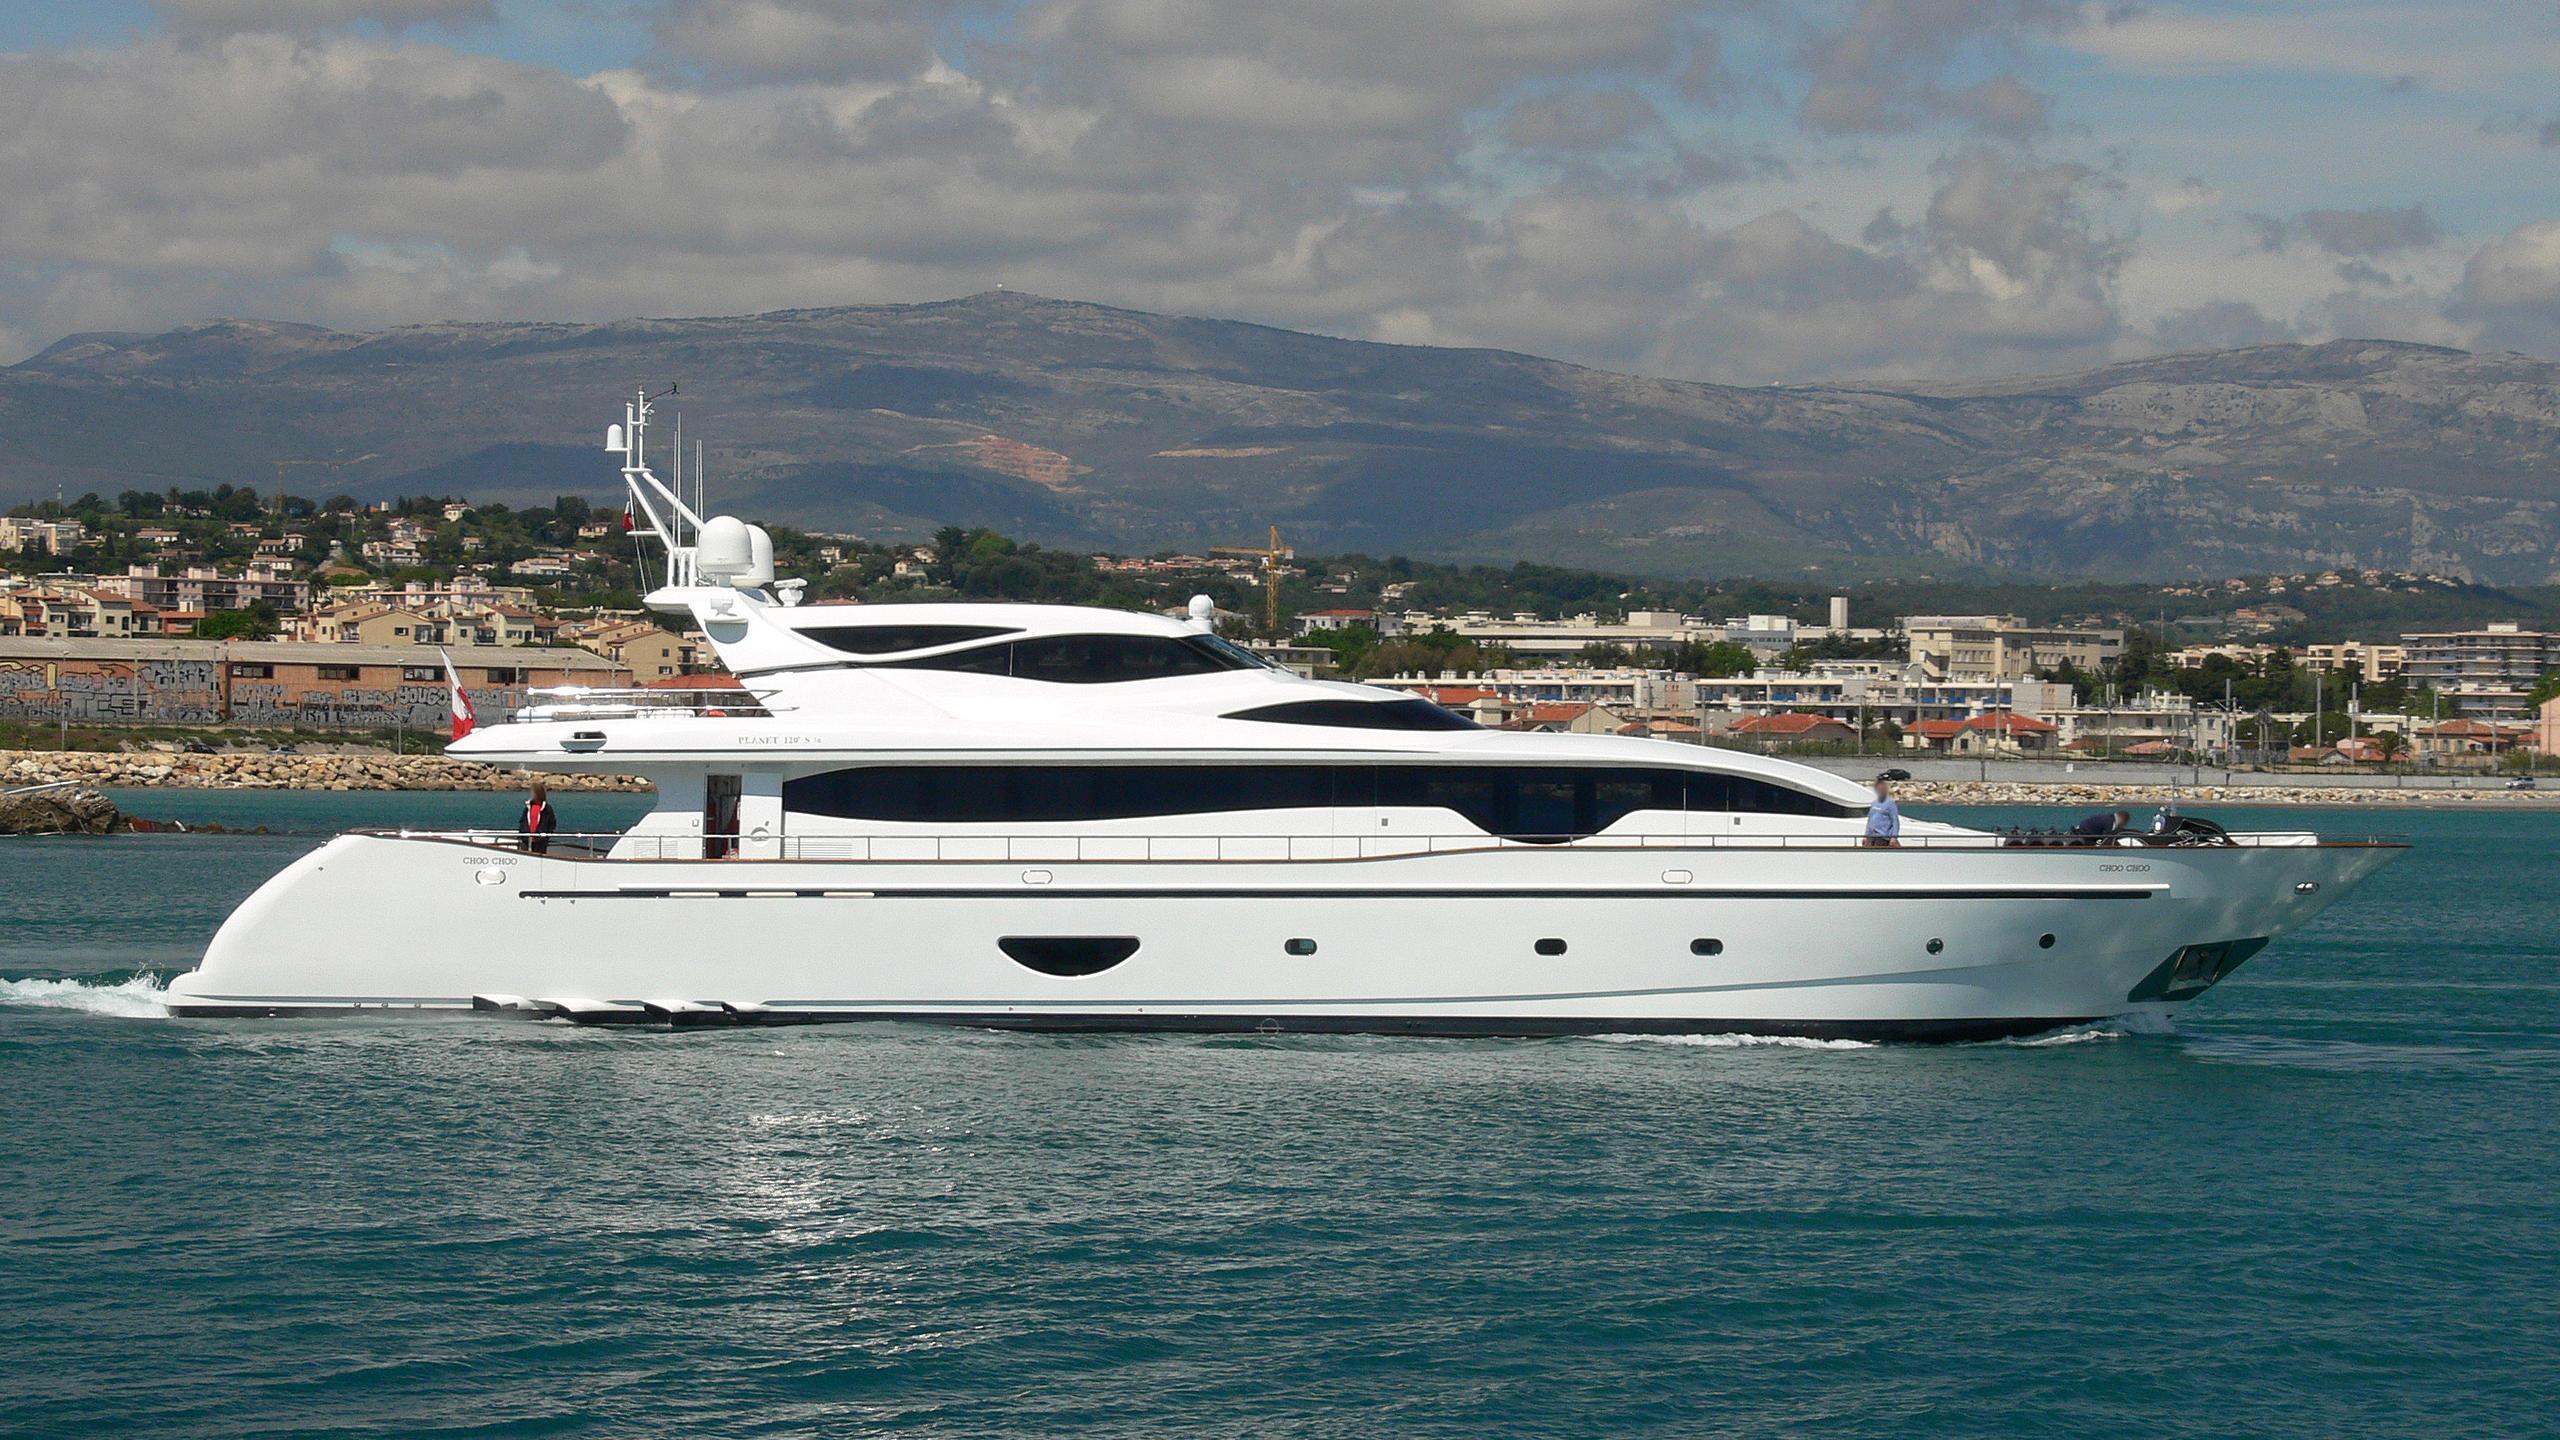 choo-choo-motor-yacht-new-versilcraft-2006-36m-profile